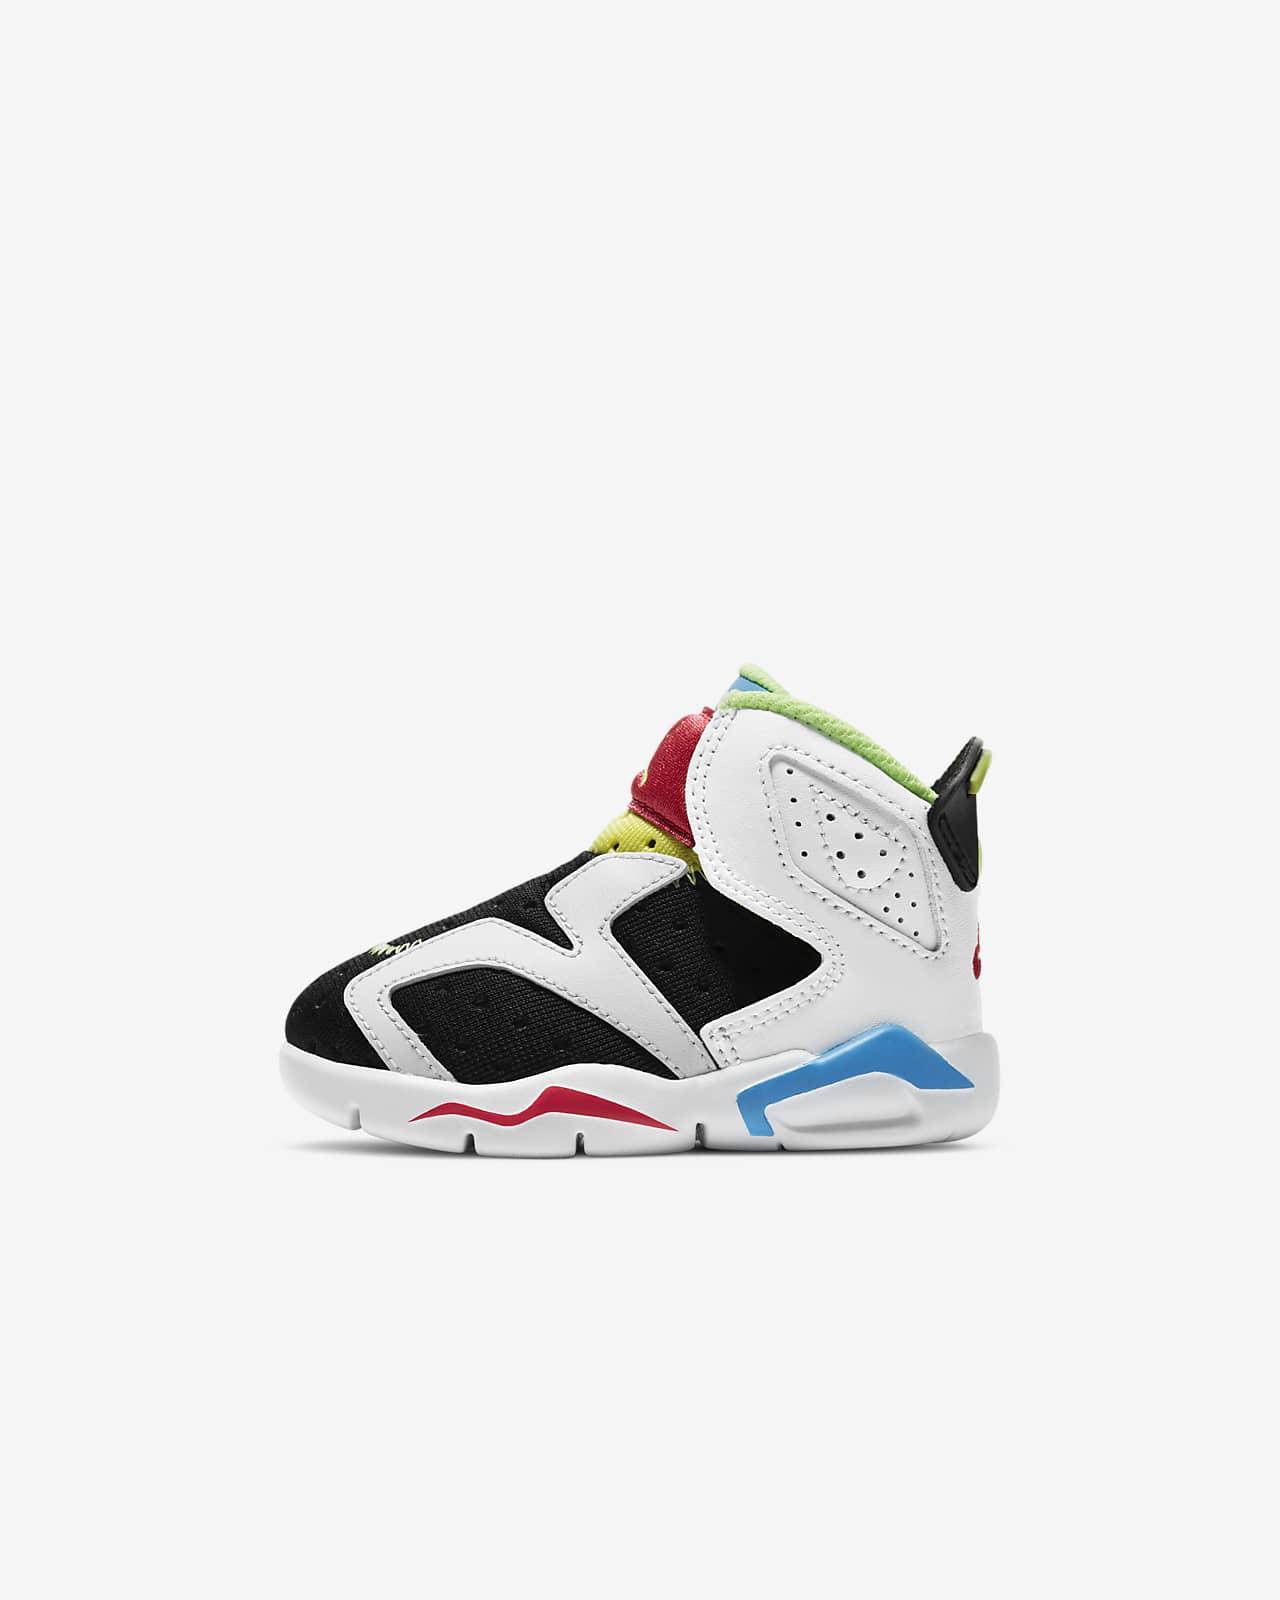 Jordan 6 Retro Little Flex TD 复刻婴童运动童鞋